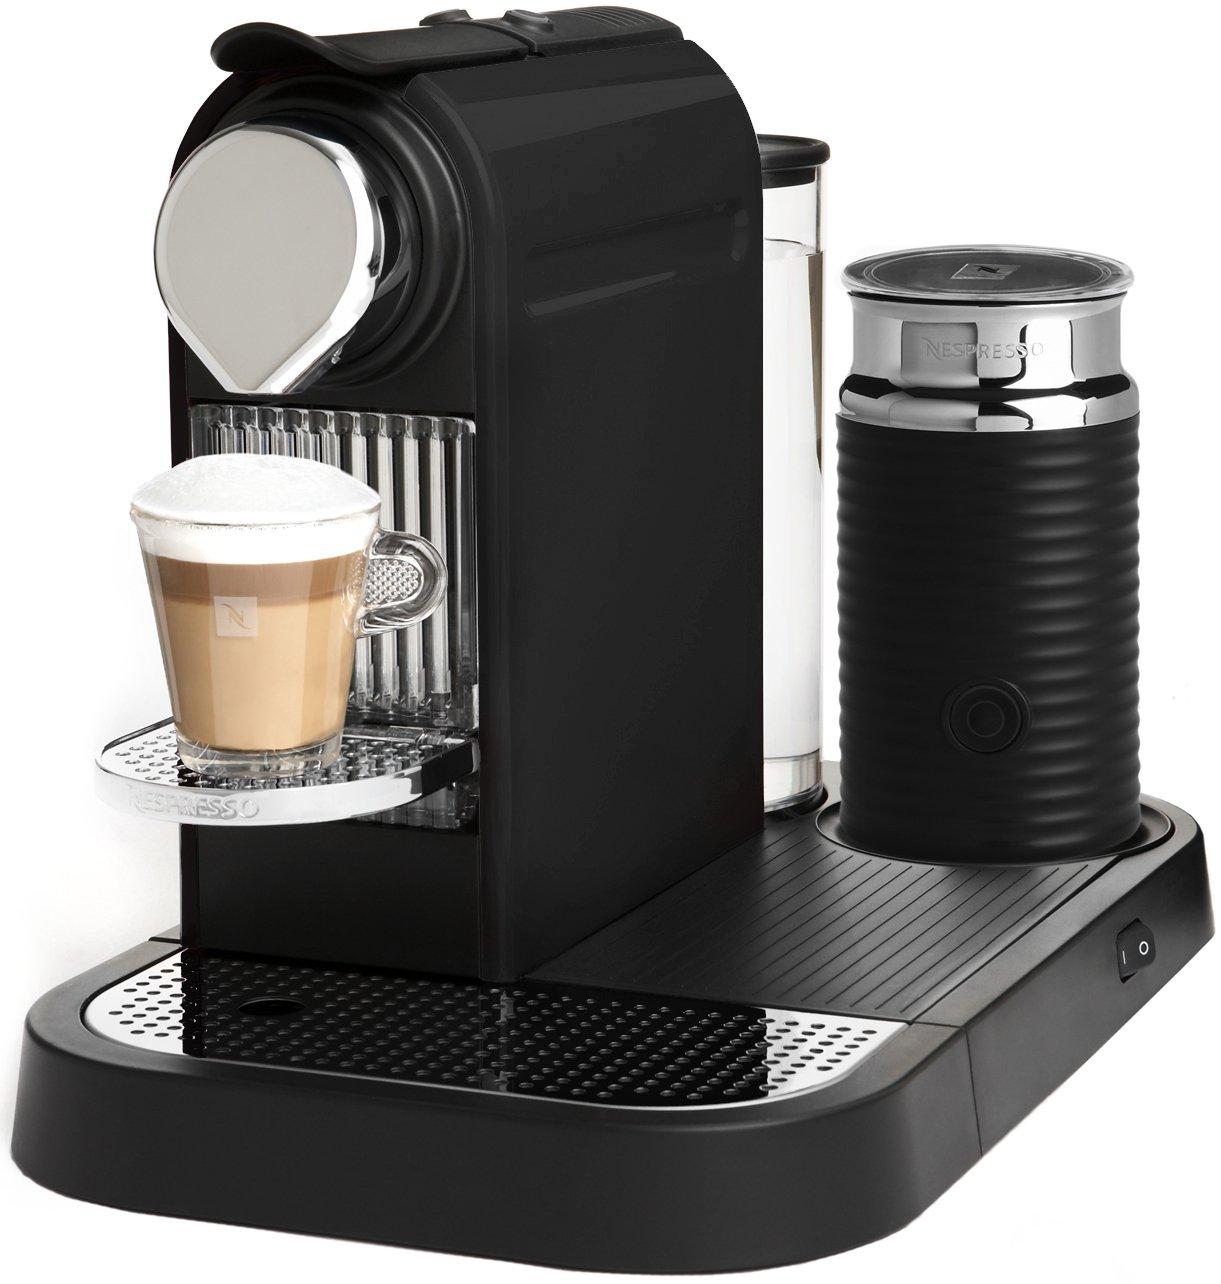 Amazon Nespresso D120 US BK NE CitiZ Automatic Single Serve Espresso Maker And Milk Frother Limousine Black Machines Kitchen Dining